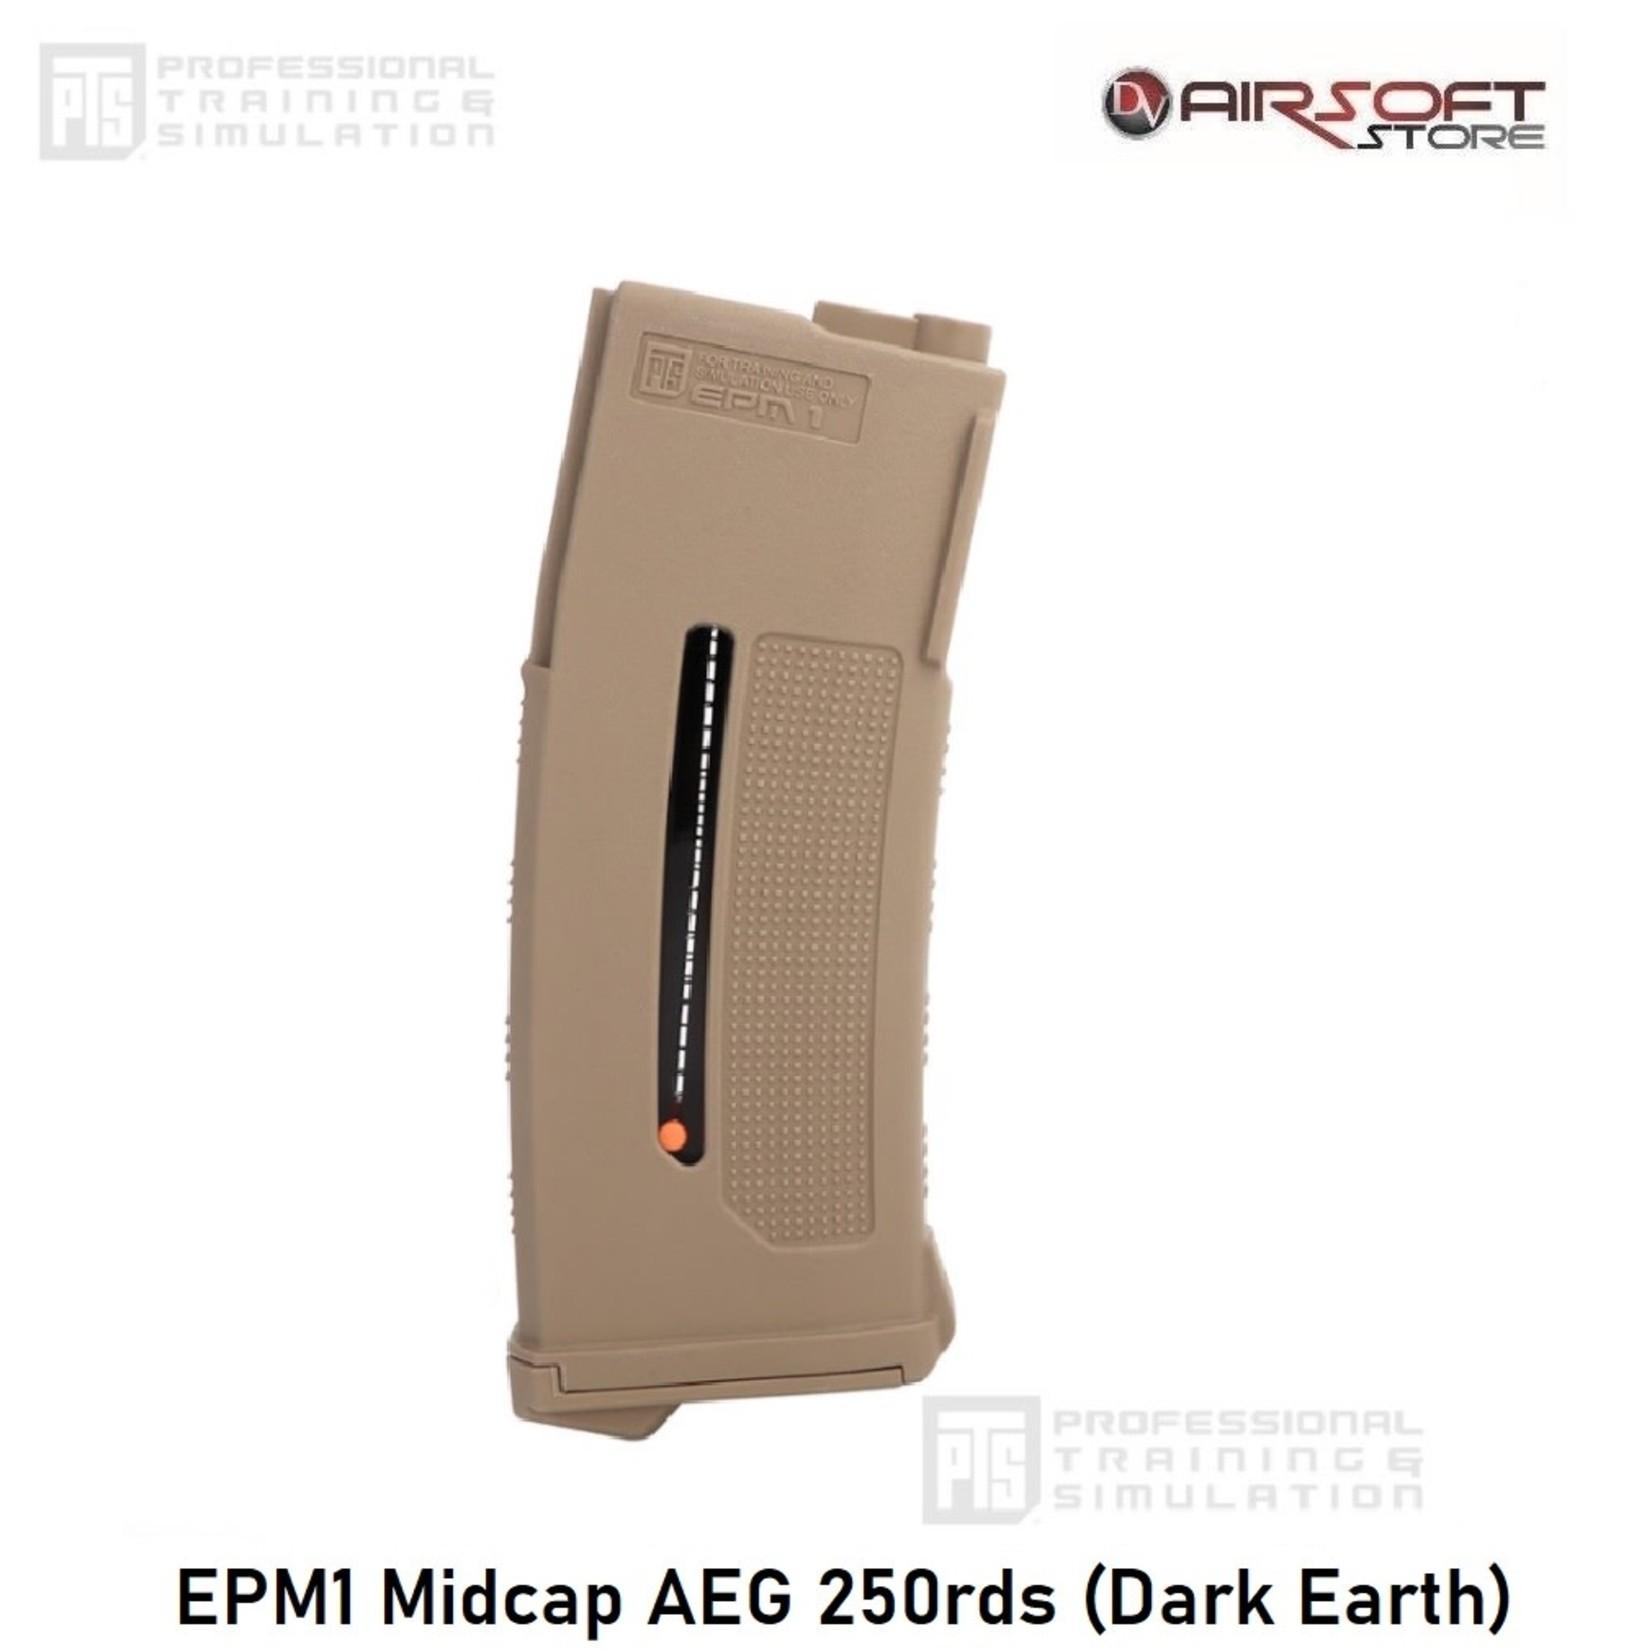 PTS EPM1 Midcap AEG 250rds (Dark Earth)